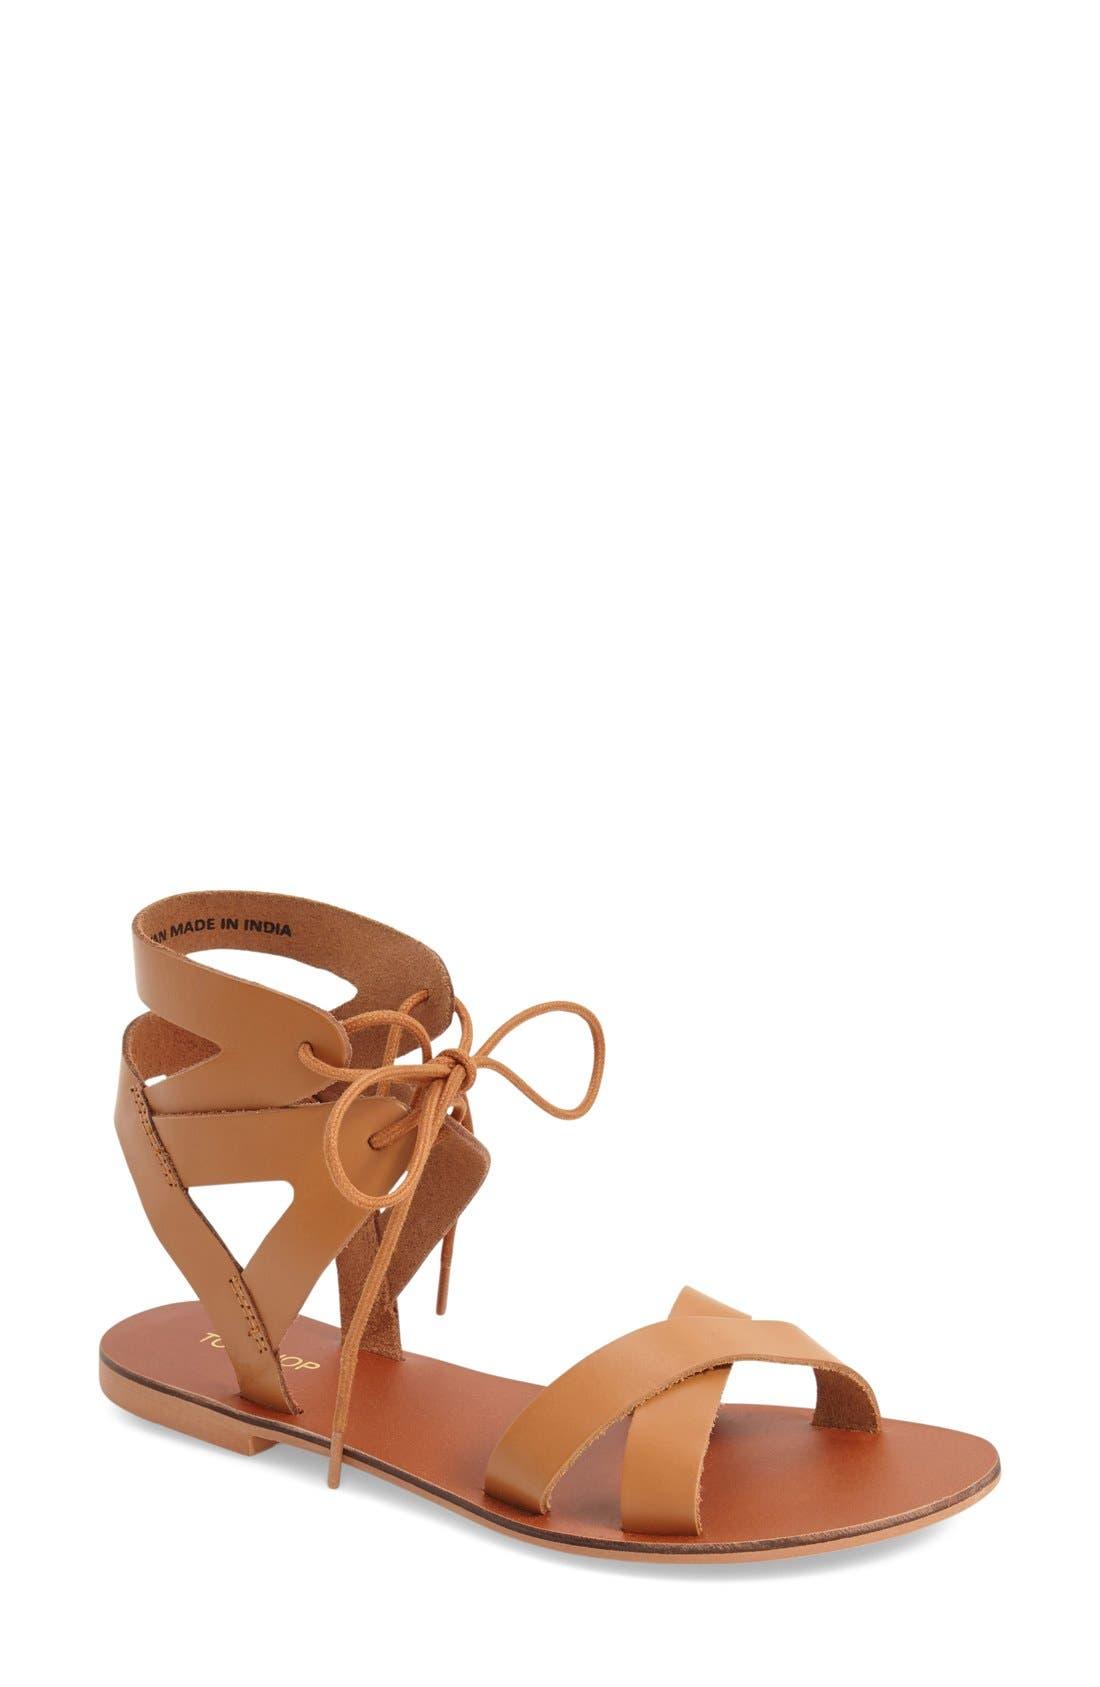 'Herb' Lace-Up Flat Sandal,                             Main thumbnail 1, color,                             210